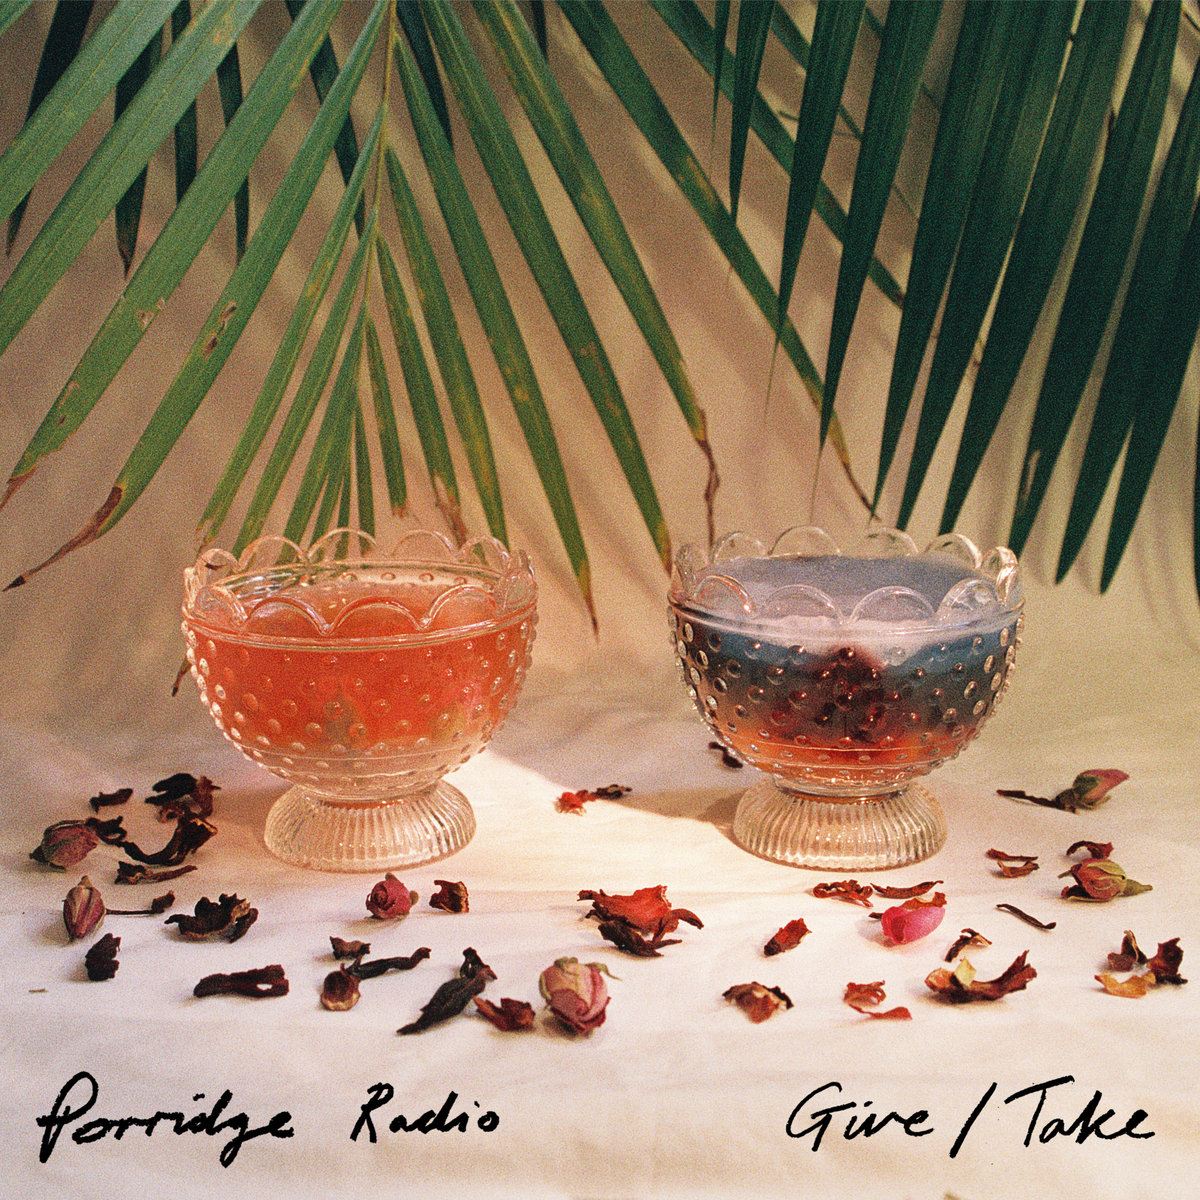 porridge radio.jpg